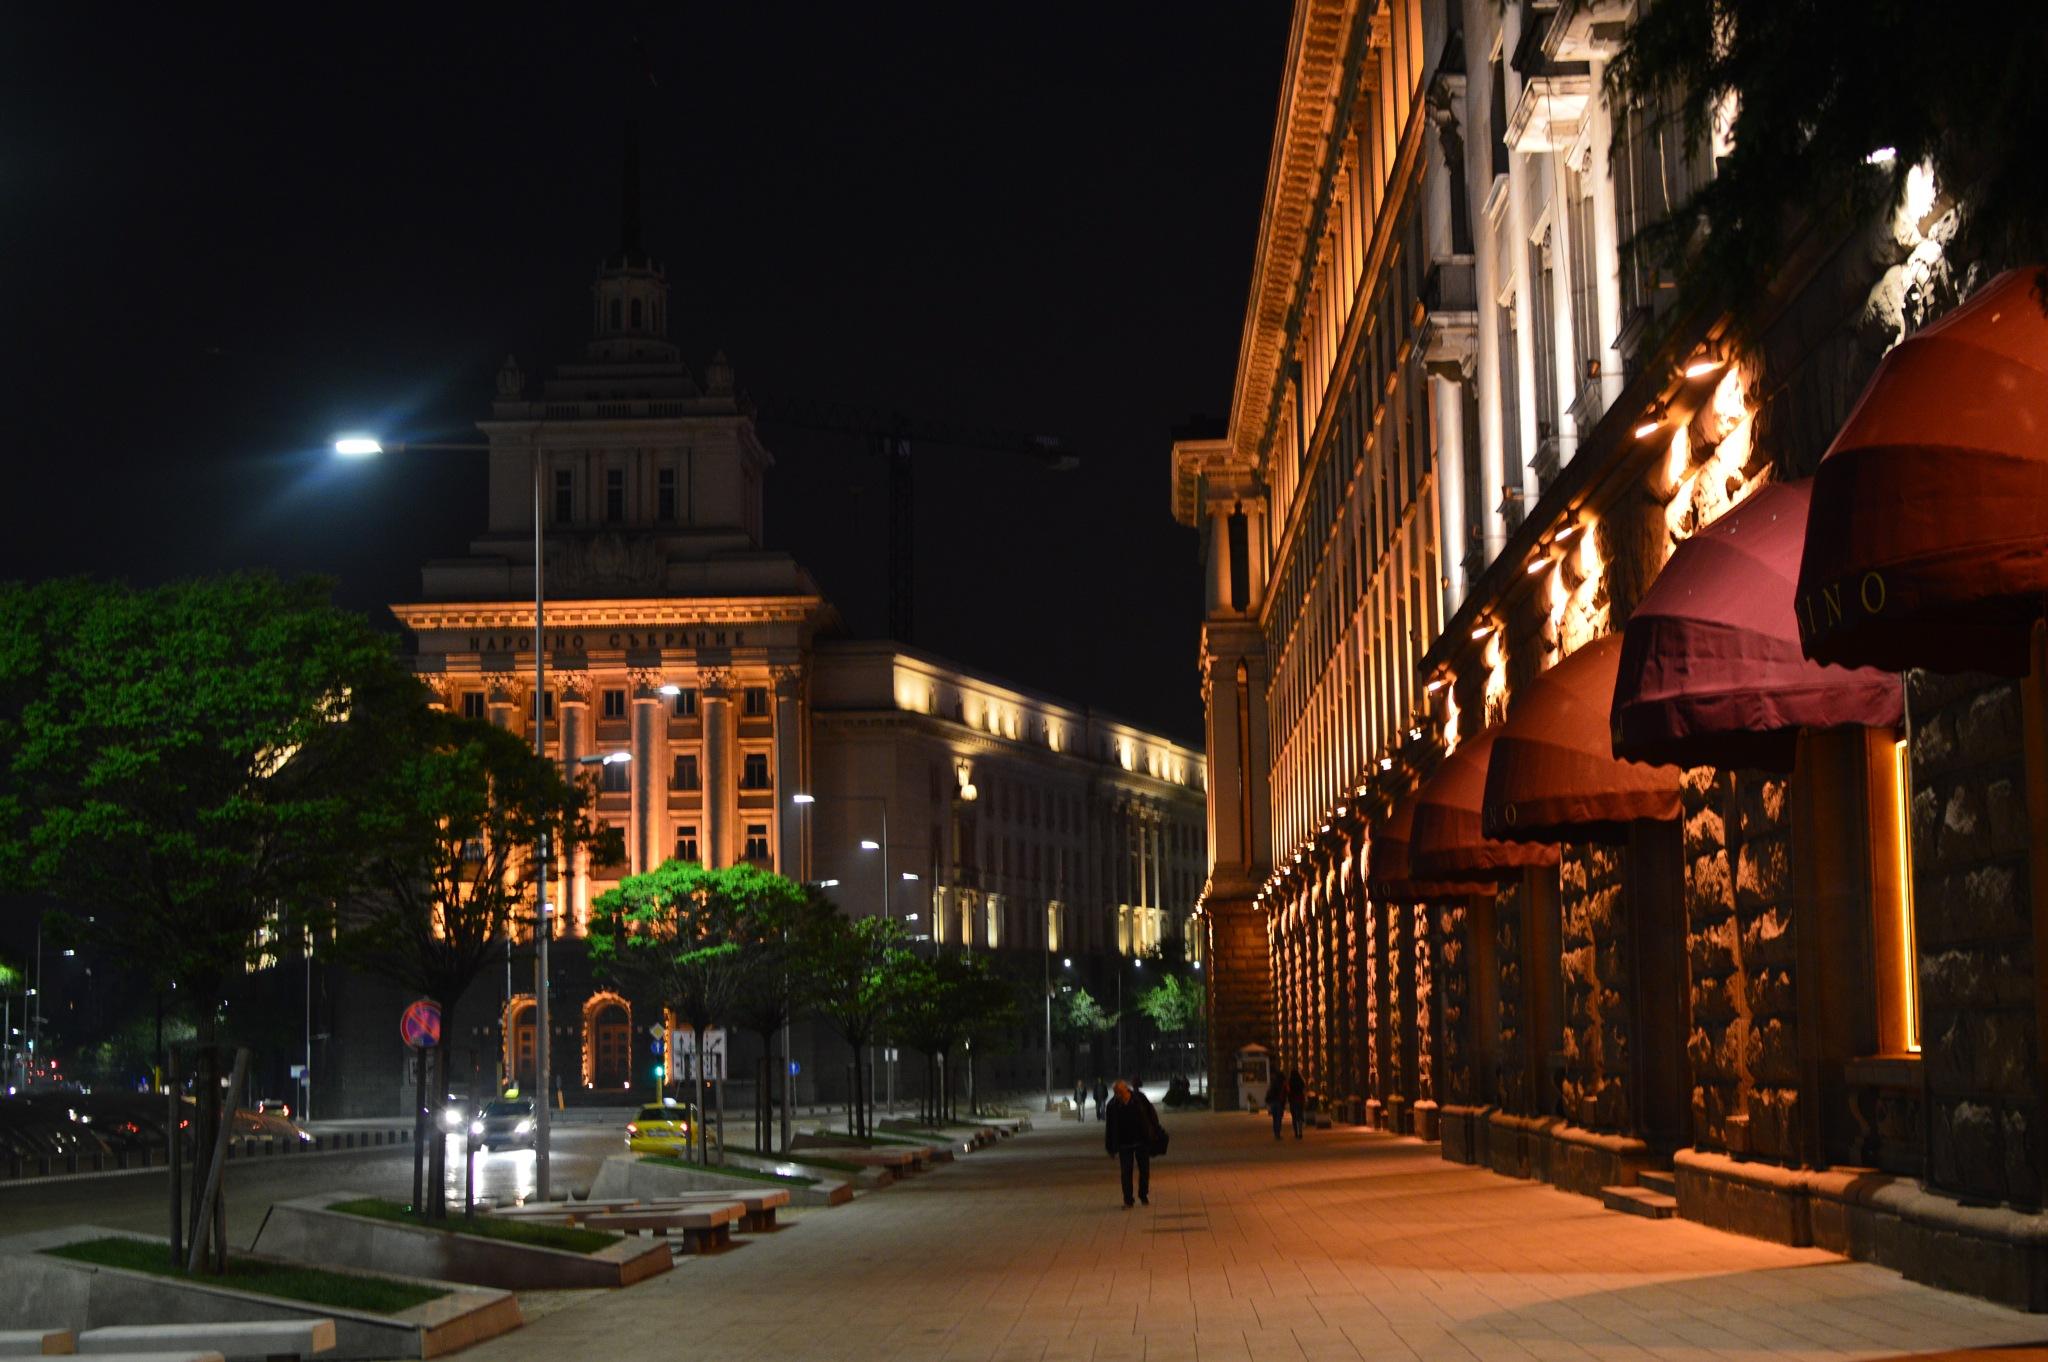 City at night  by petya.angelova.9